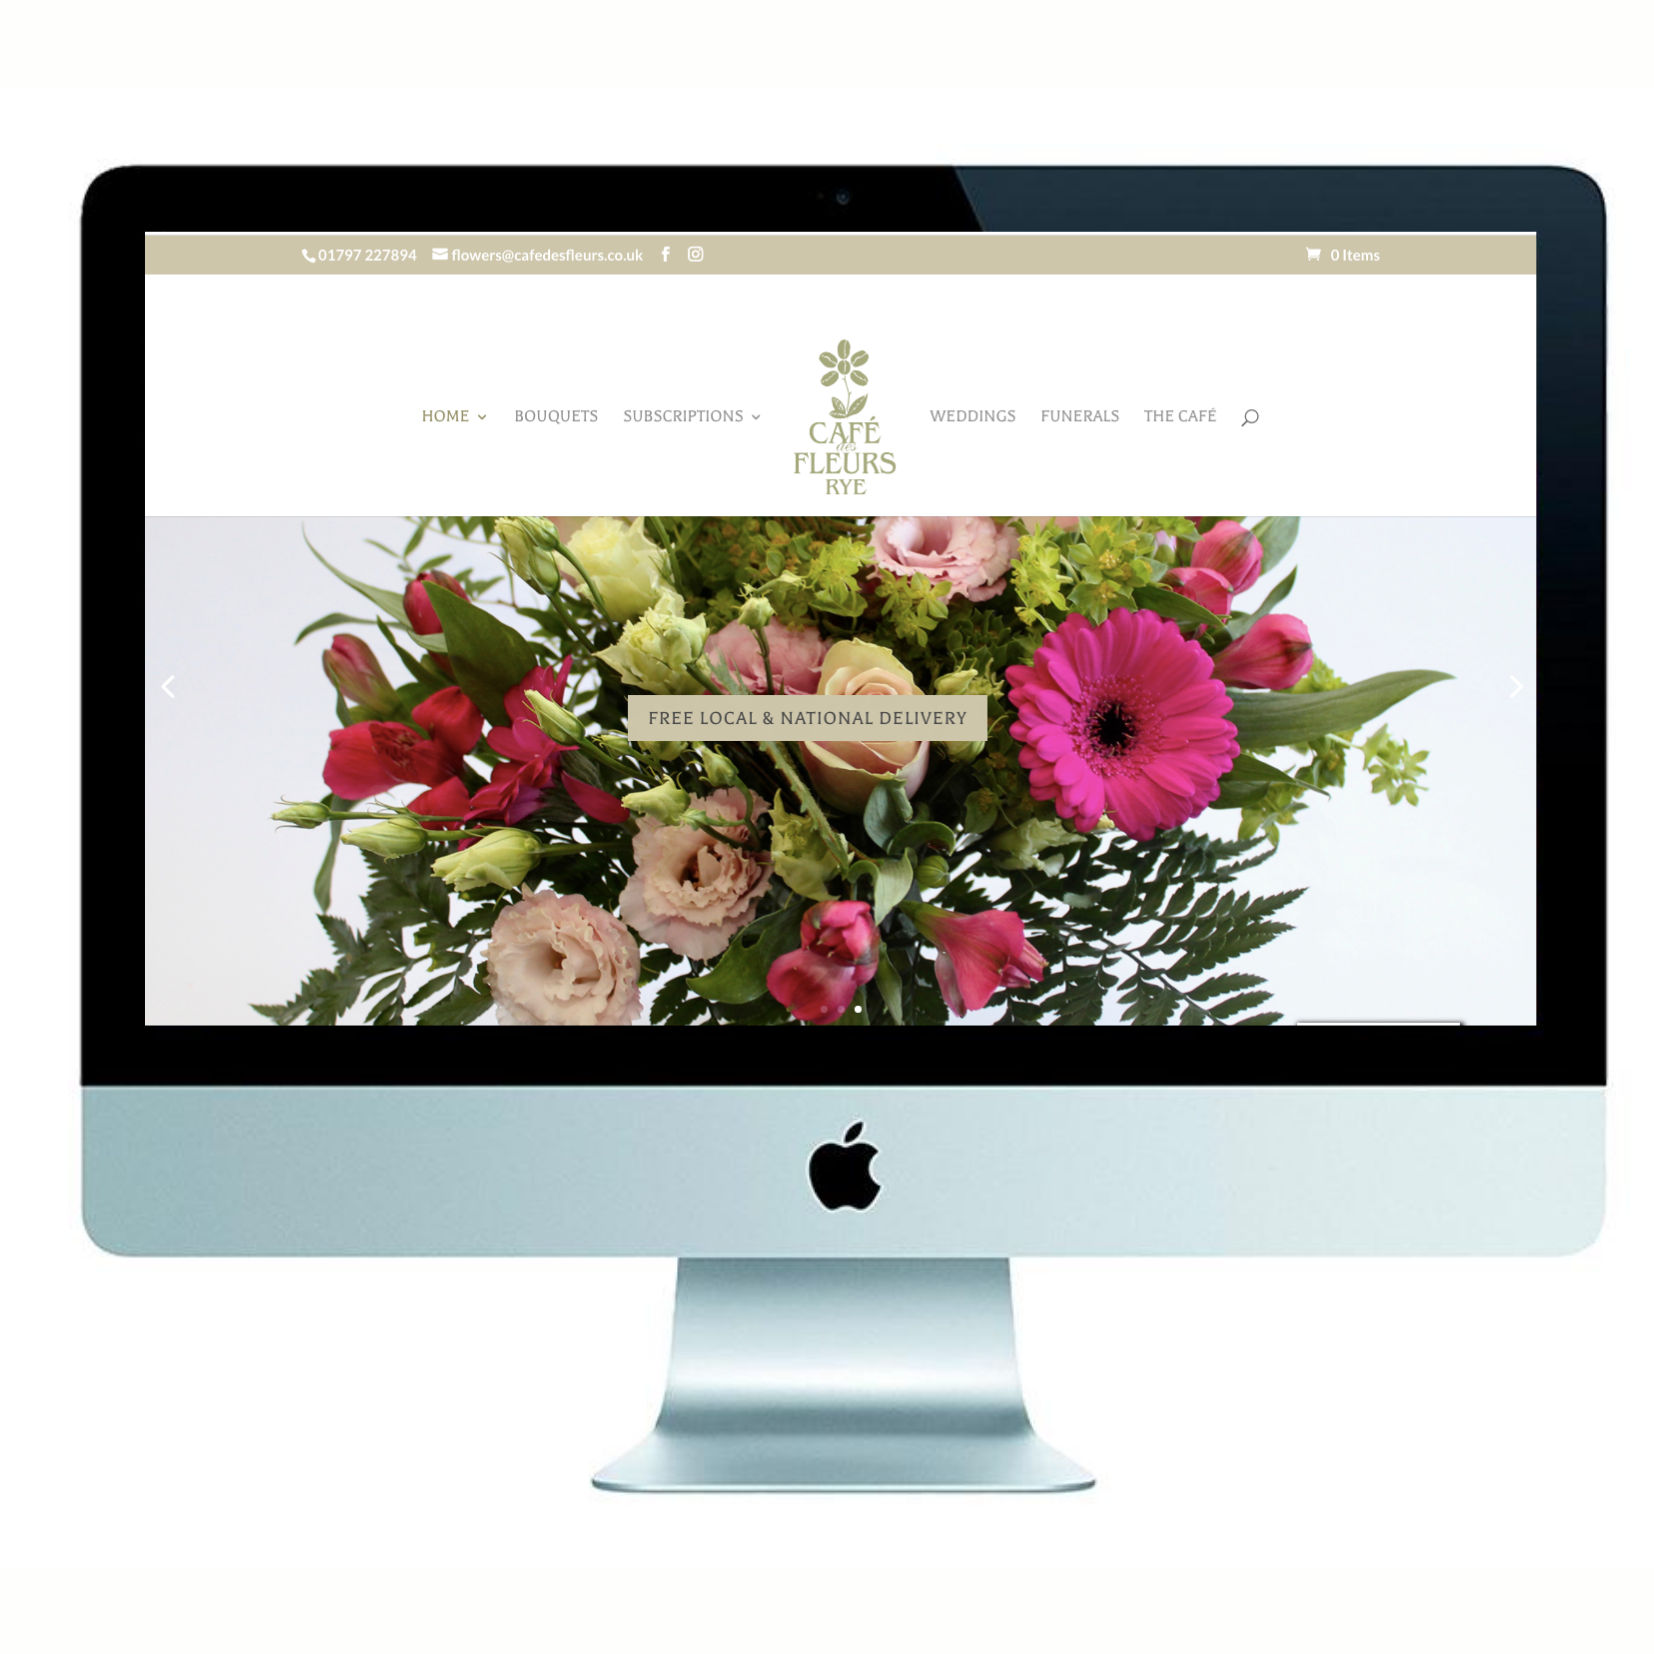 rockpool creative, marketing agency, kent, marketing agency east sussex, Rockpool portfolio Cafe des Fleurs, florist, local florist, florest Rye, subscription flowers, florist Kent, florist East Sussex